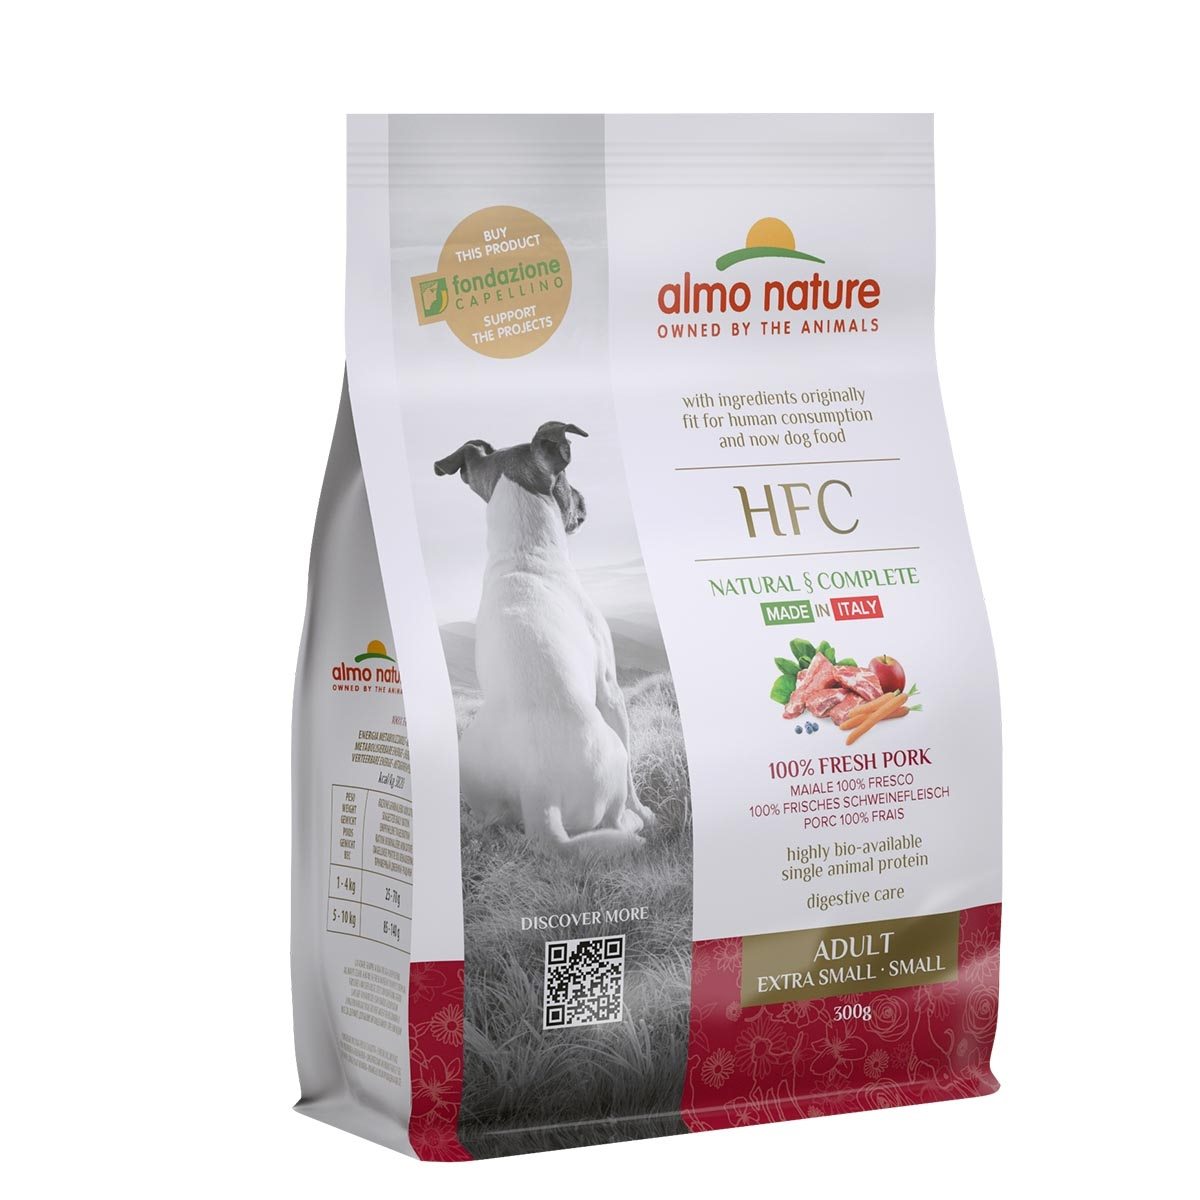 DOG DRY HFC ADULT SMALL CERDO 300G